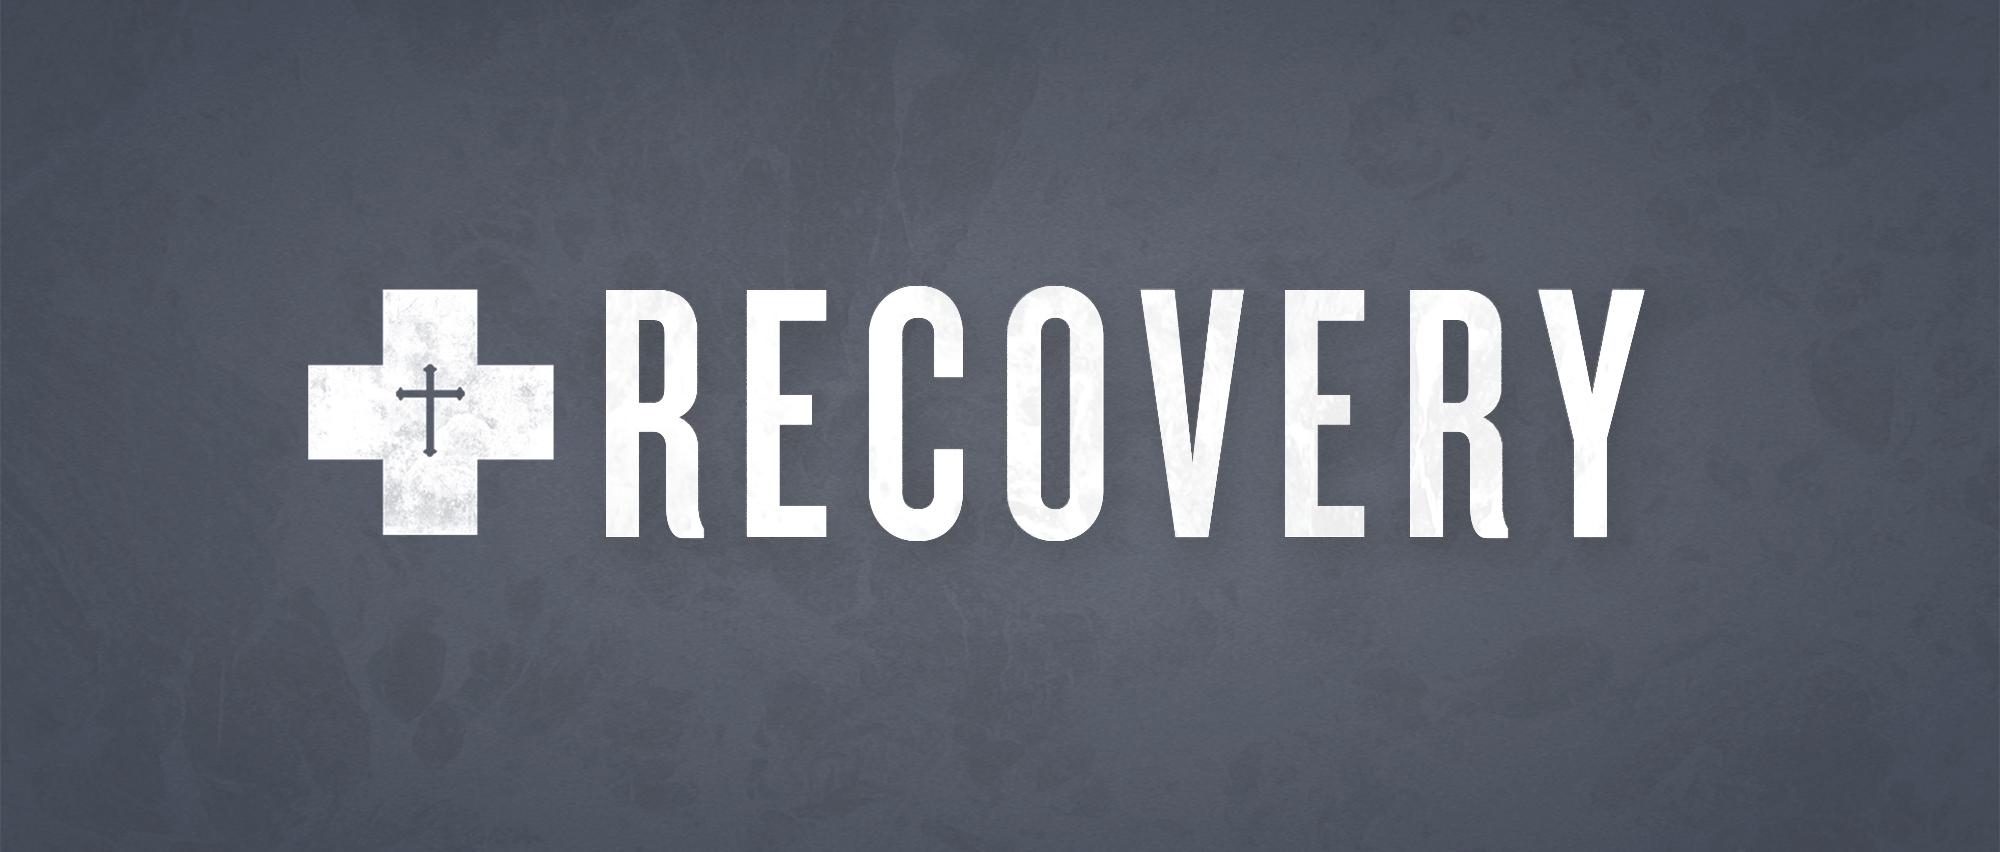 New REcovery Web.jpg